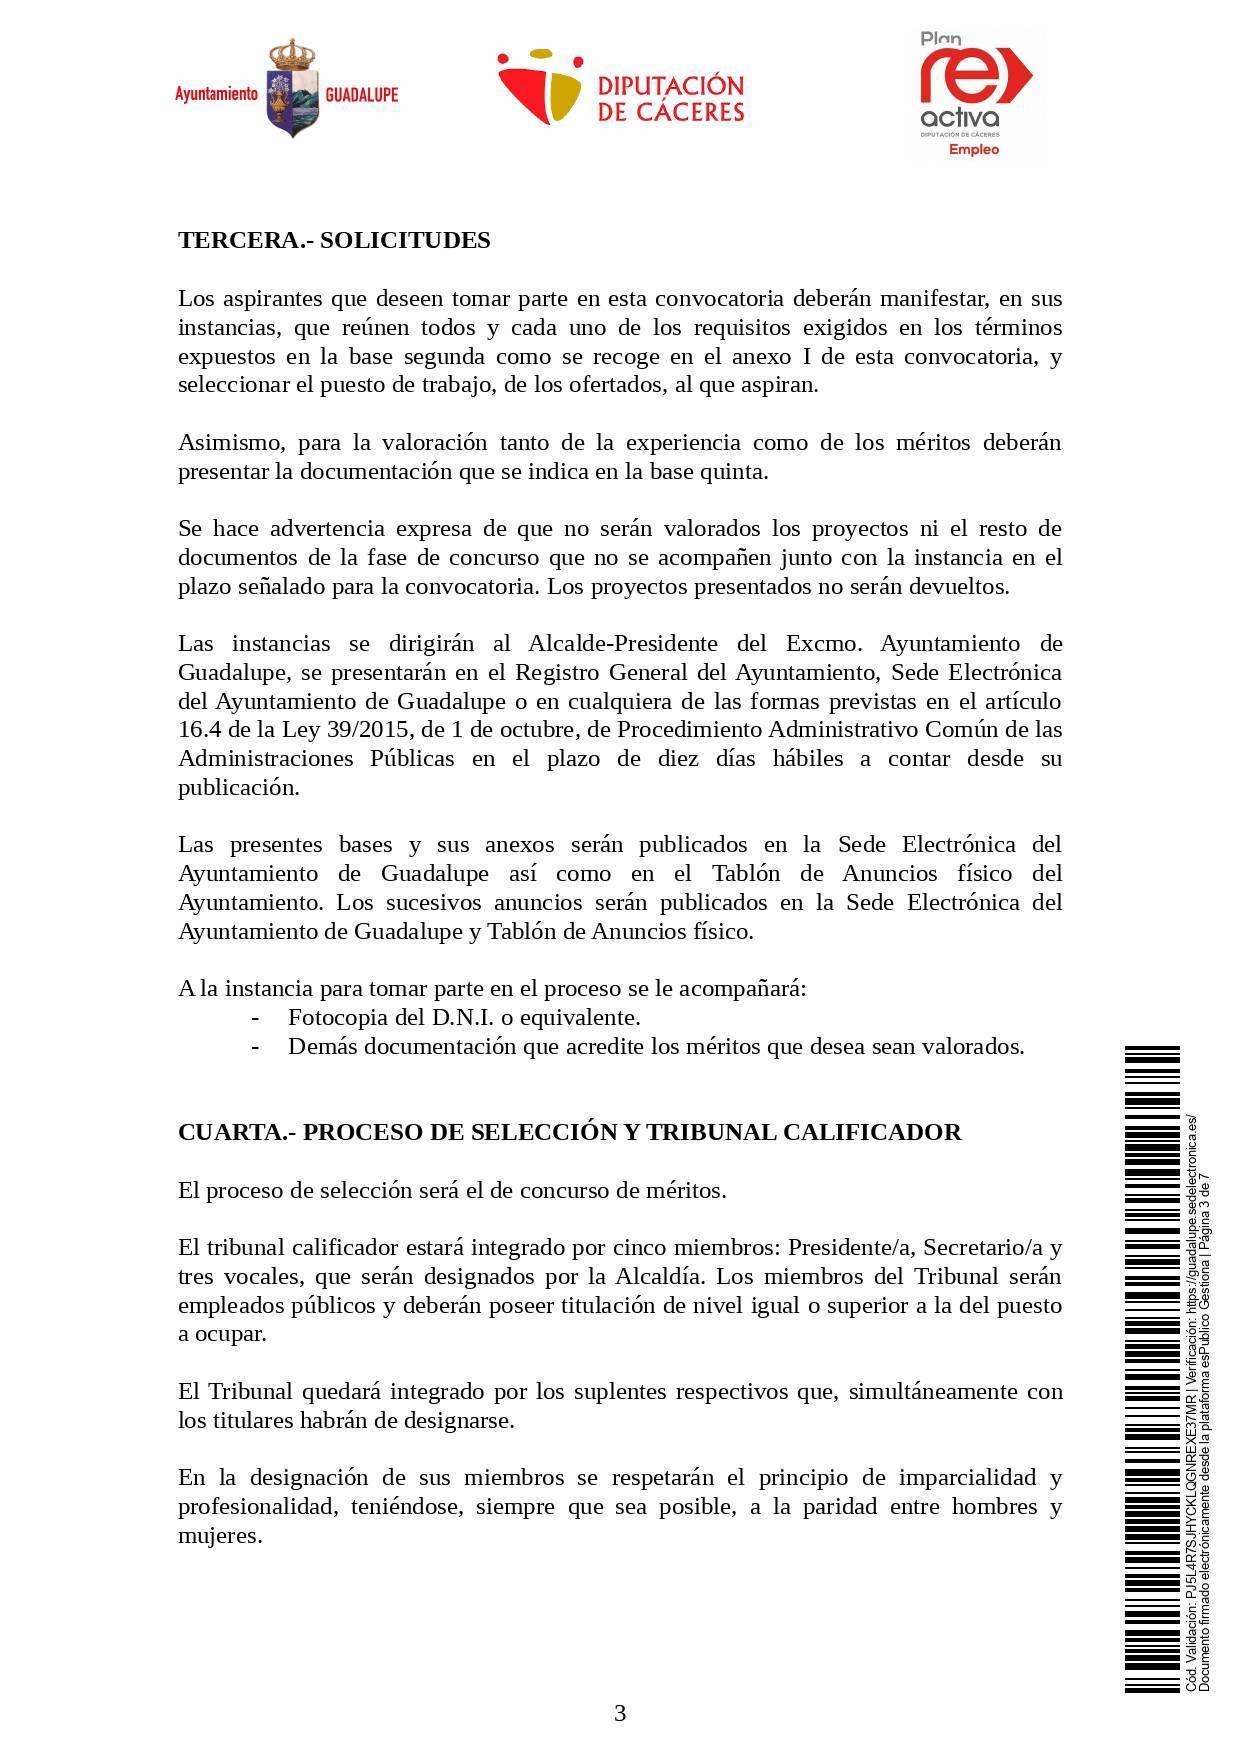 Un operario-a de servicios múltiples y dos operarios-as de limpieza (2021) - Guadalupe (Cáceres) 3